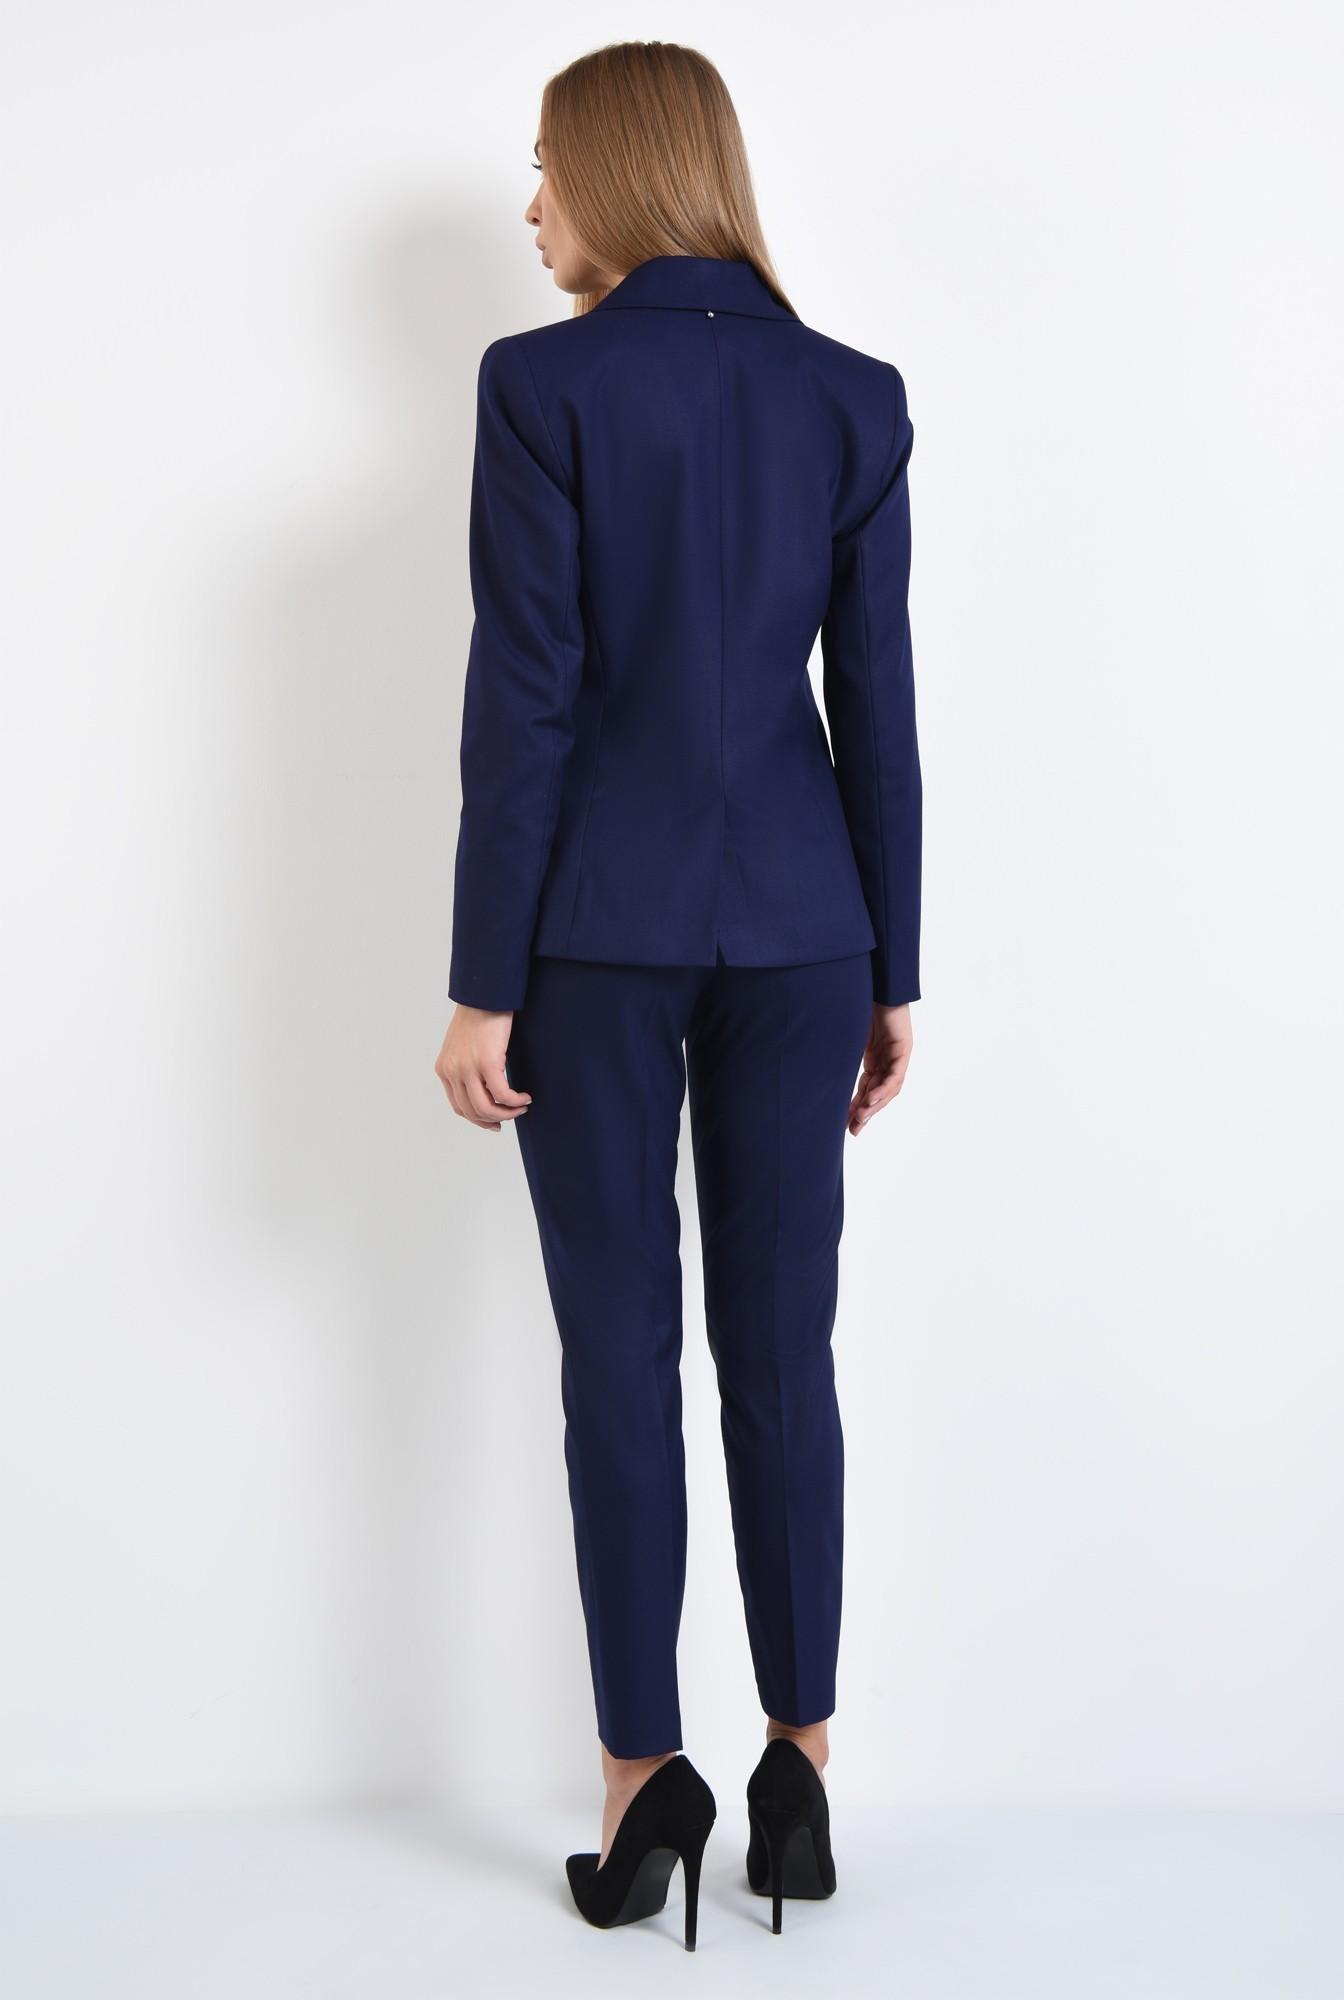 1 - pantaloni tigareta, croi conic, albastru